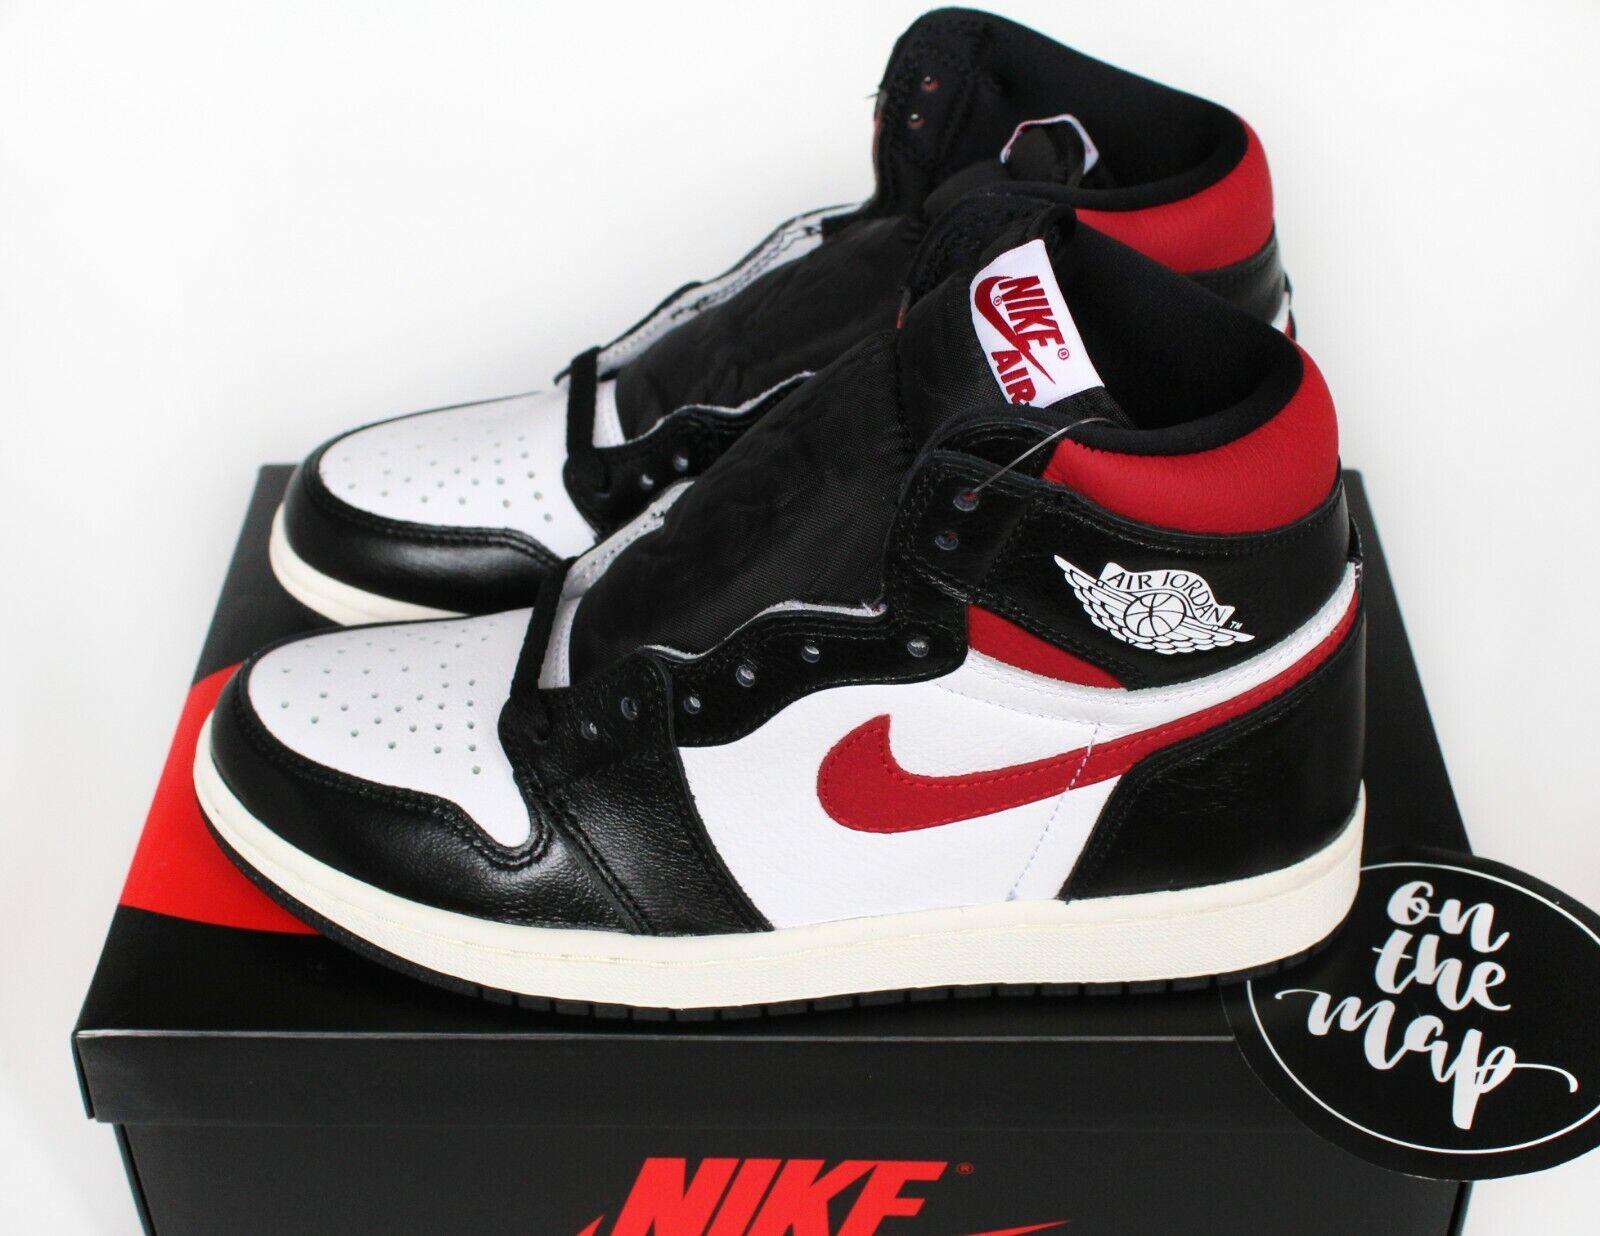 new style acf7b 68ea9 Nike Air Jordan 1 Retro High OG Black Gym Red White 2019 UK 5 6 US New